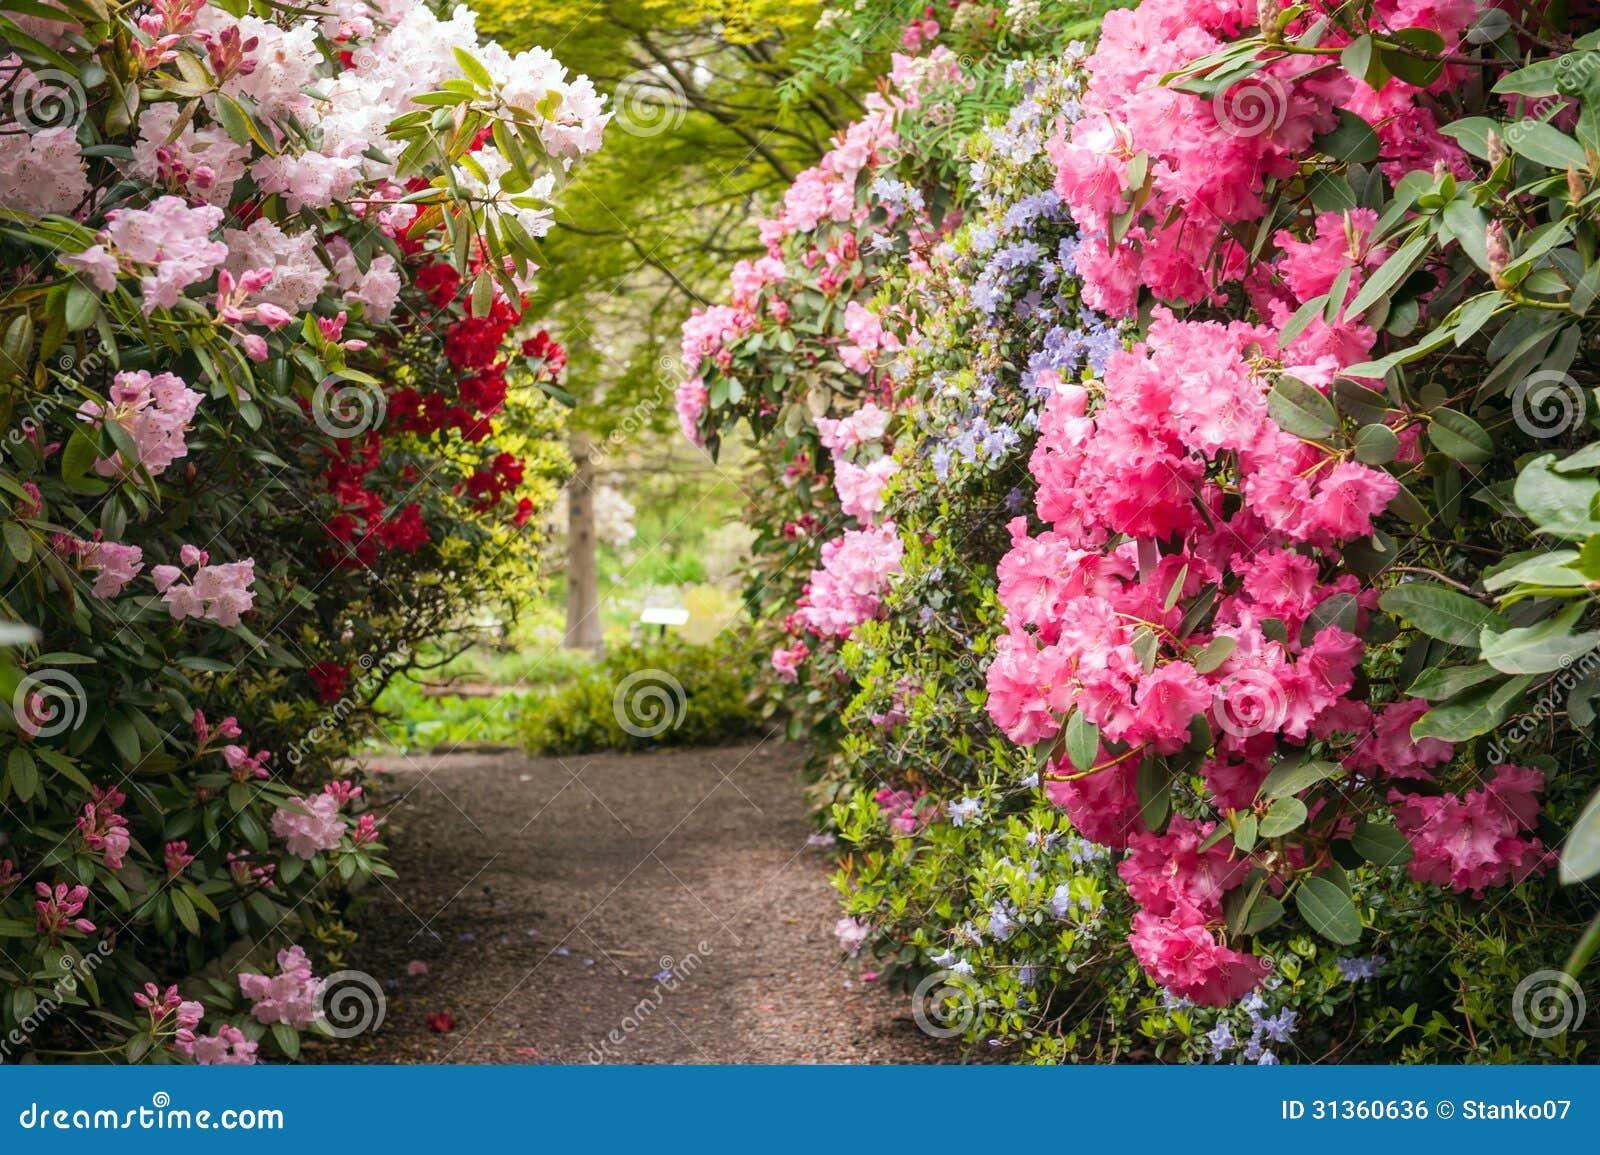 Beautiful flower garden path - Beautiful Flowers Garden Path